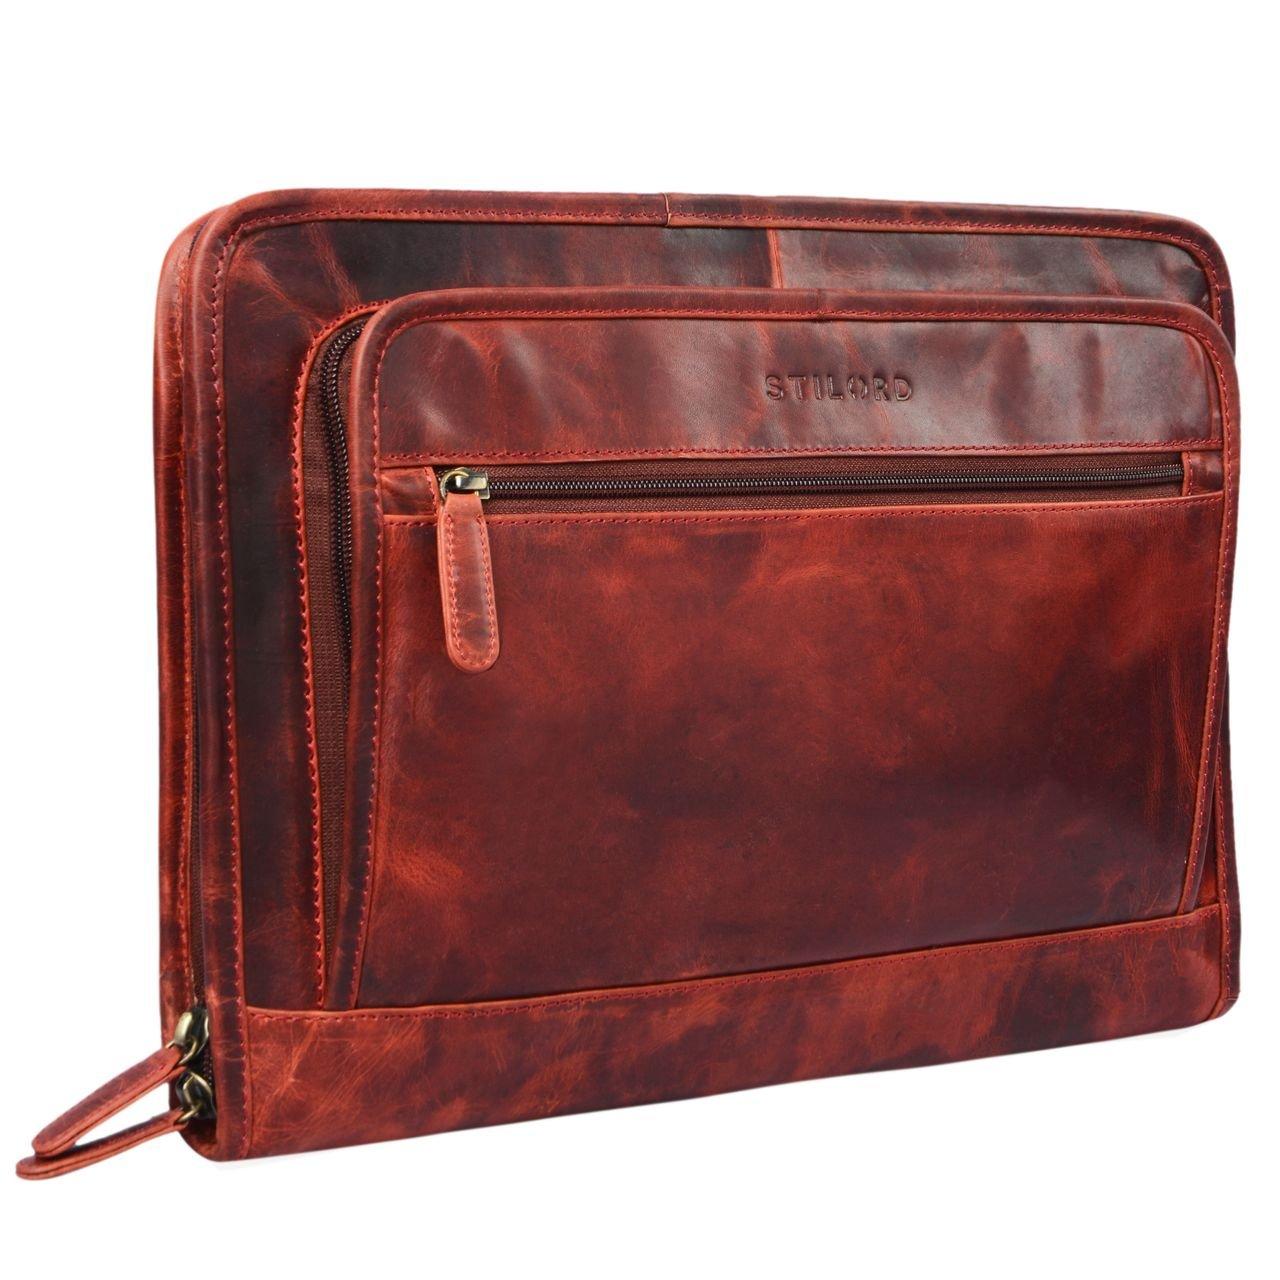 STILORD 'Maximilian' Folder leather 13,3 inch Vintage Notebook MacBook Case Bag Cover Briefcase Envelope Netbook, Colour:dark - brown